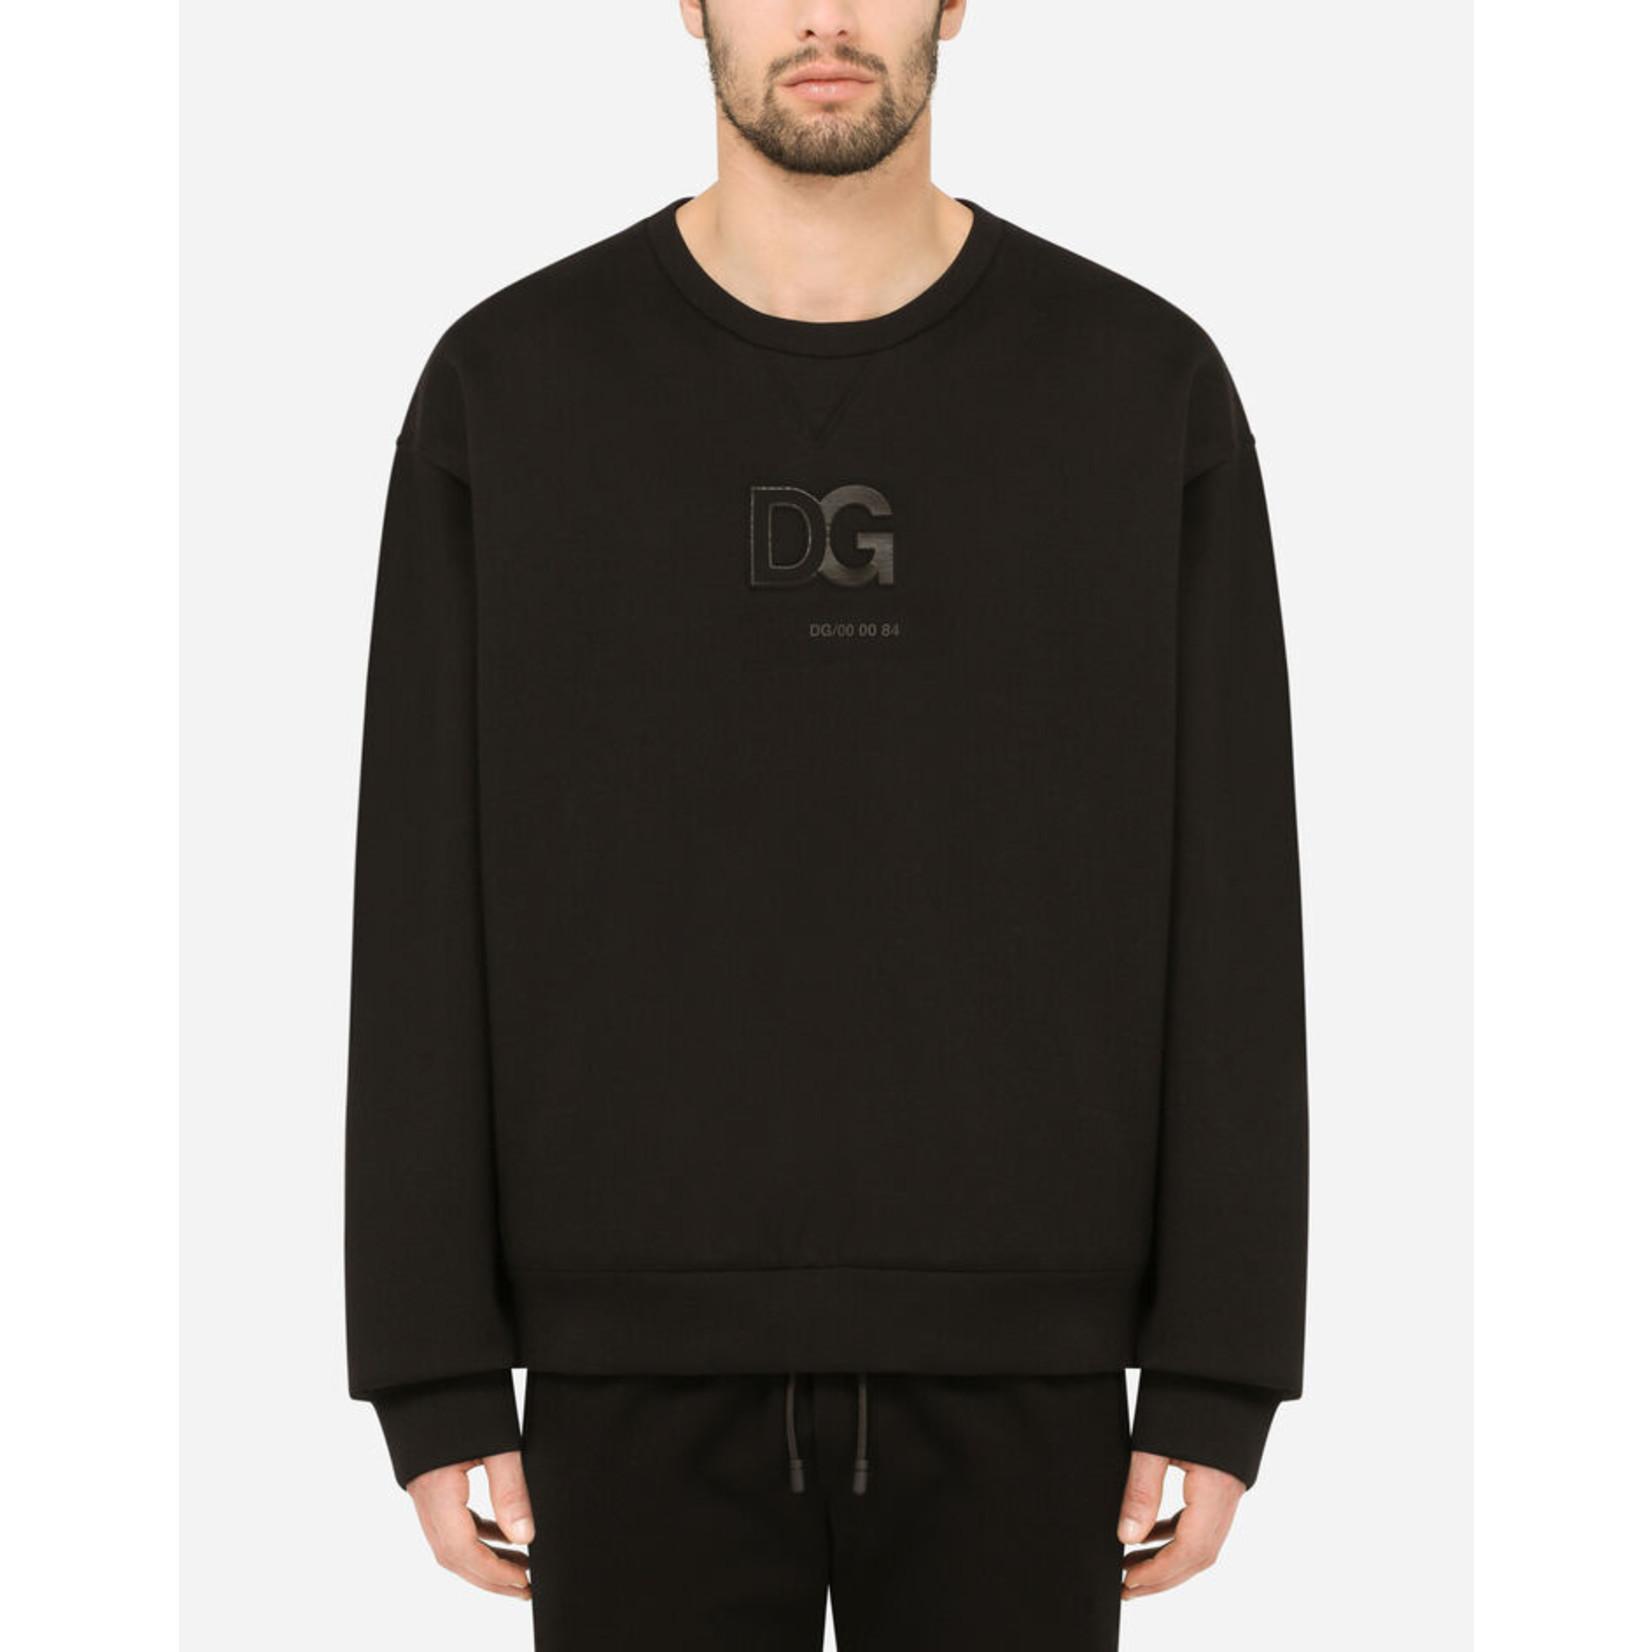 Dolce&Gabbana Sweatshirt 42619